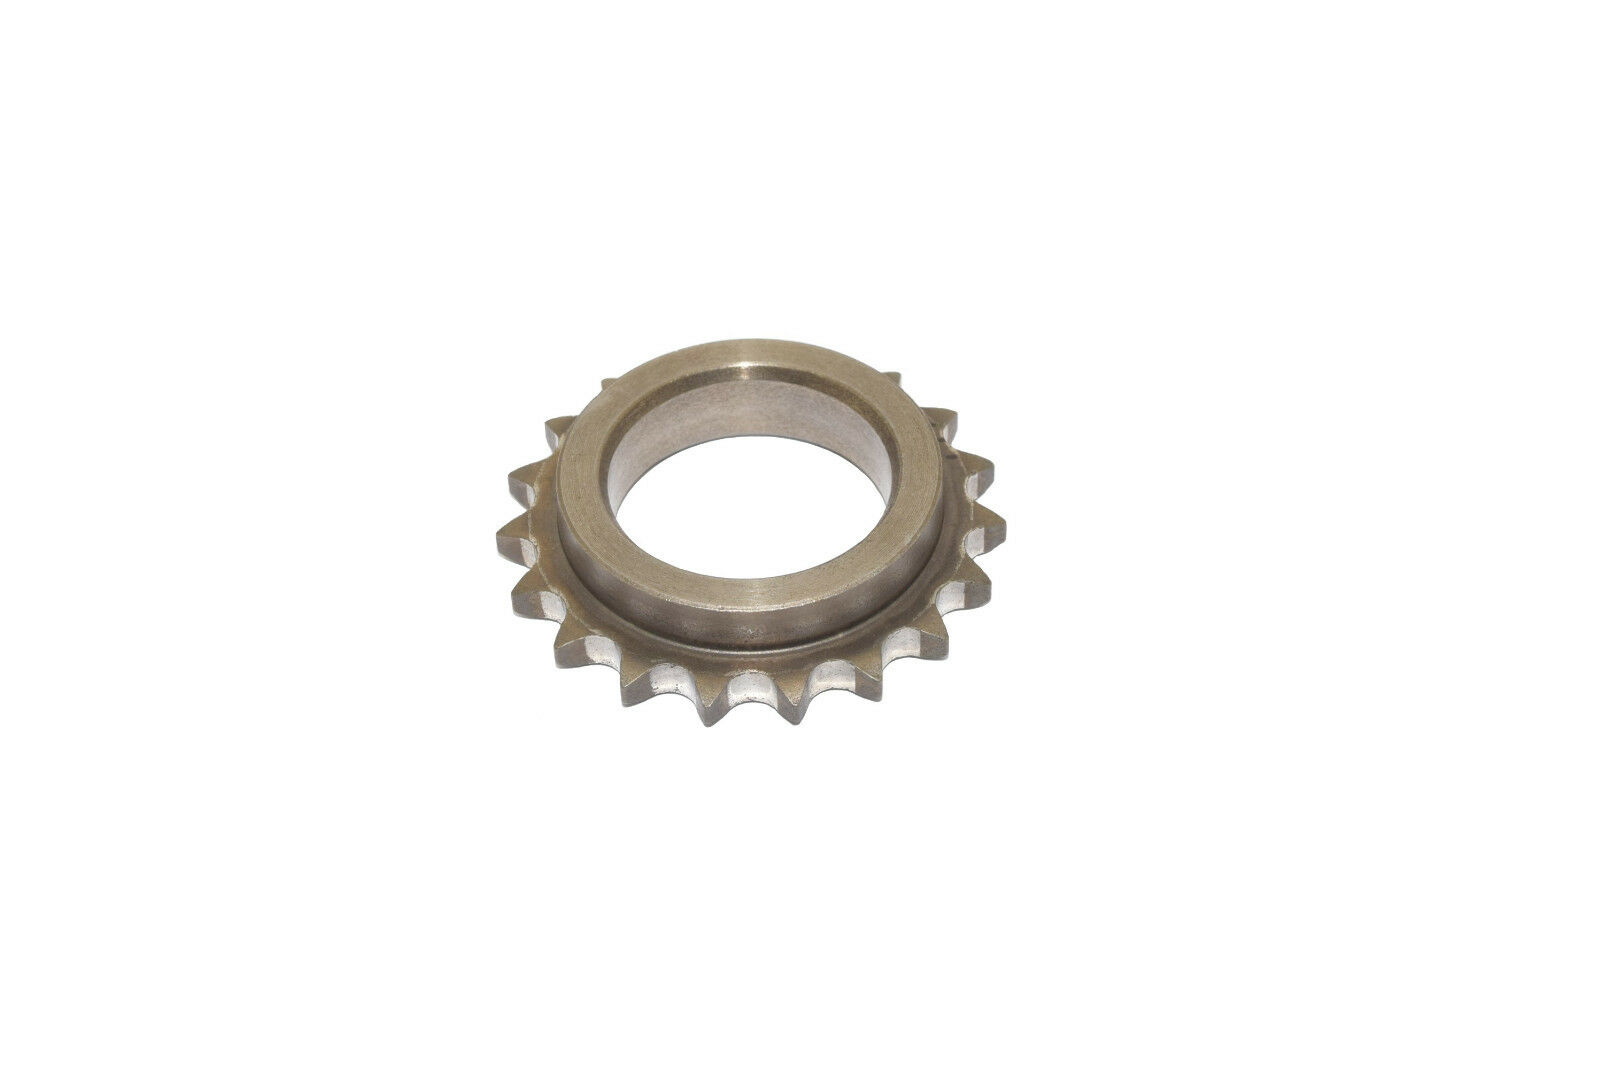 Genuine Bmw Crankshaft Timing Gear 11317502180 Ebay 325xi Belt